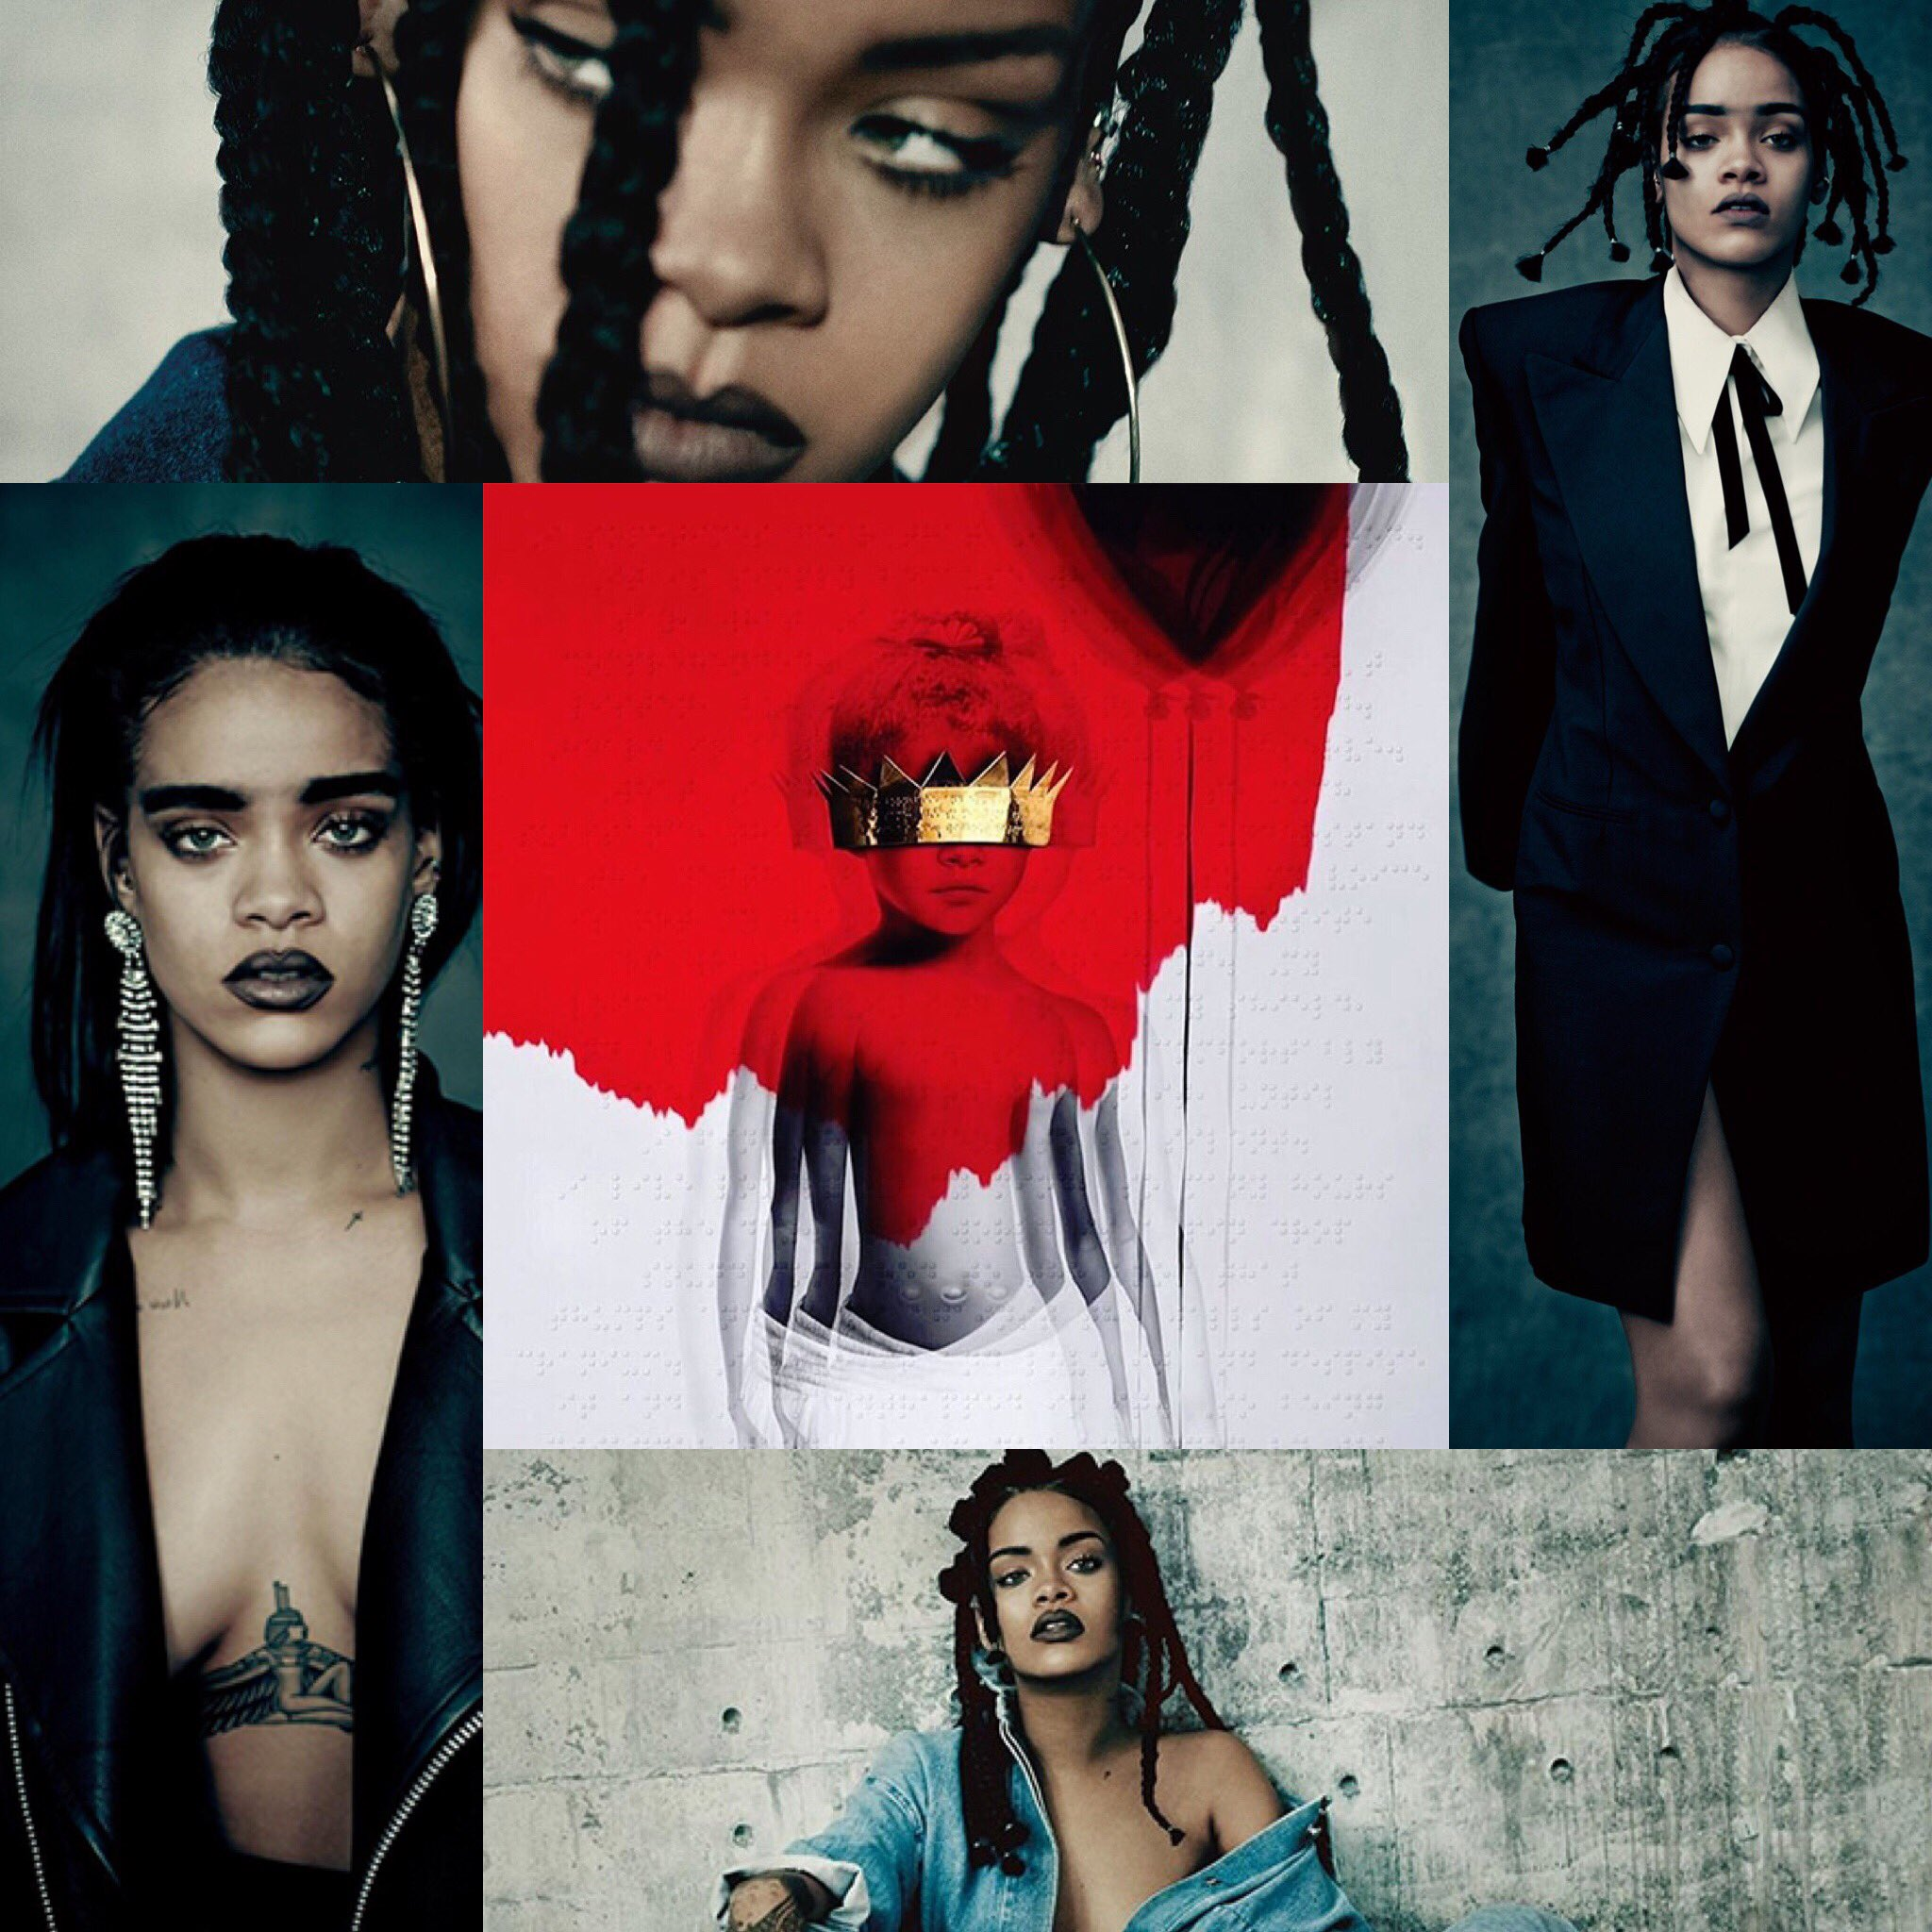 Happy second birthday to Rihanna s Album Anti